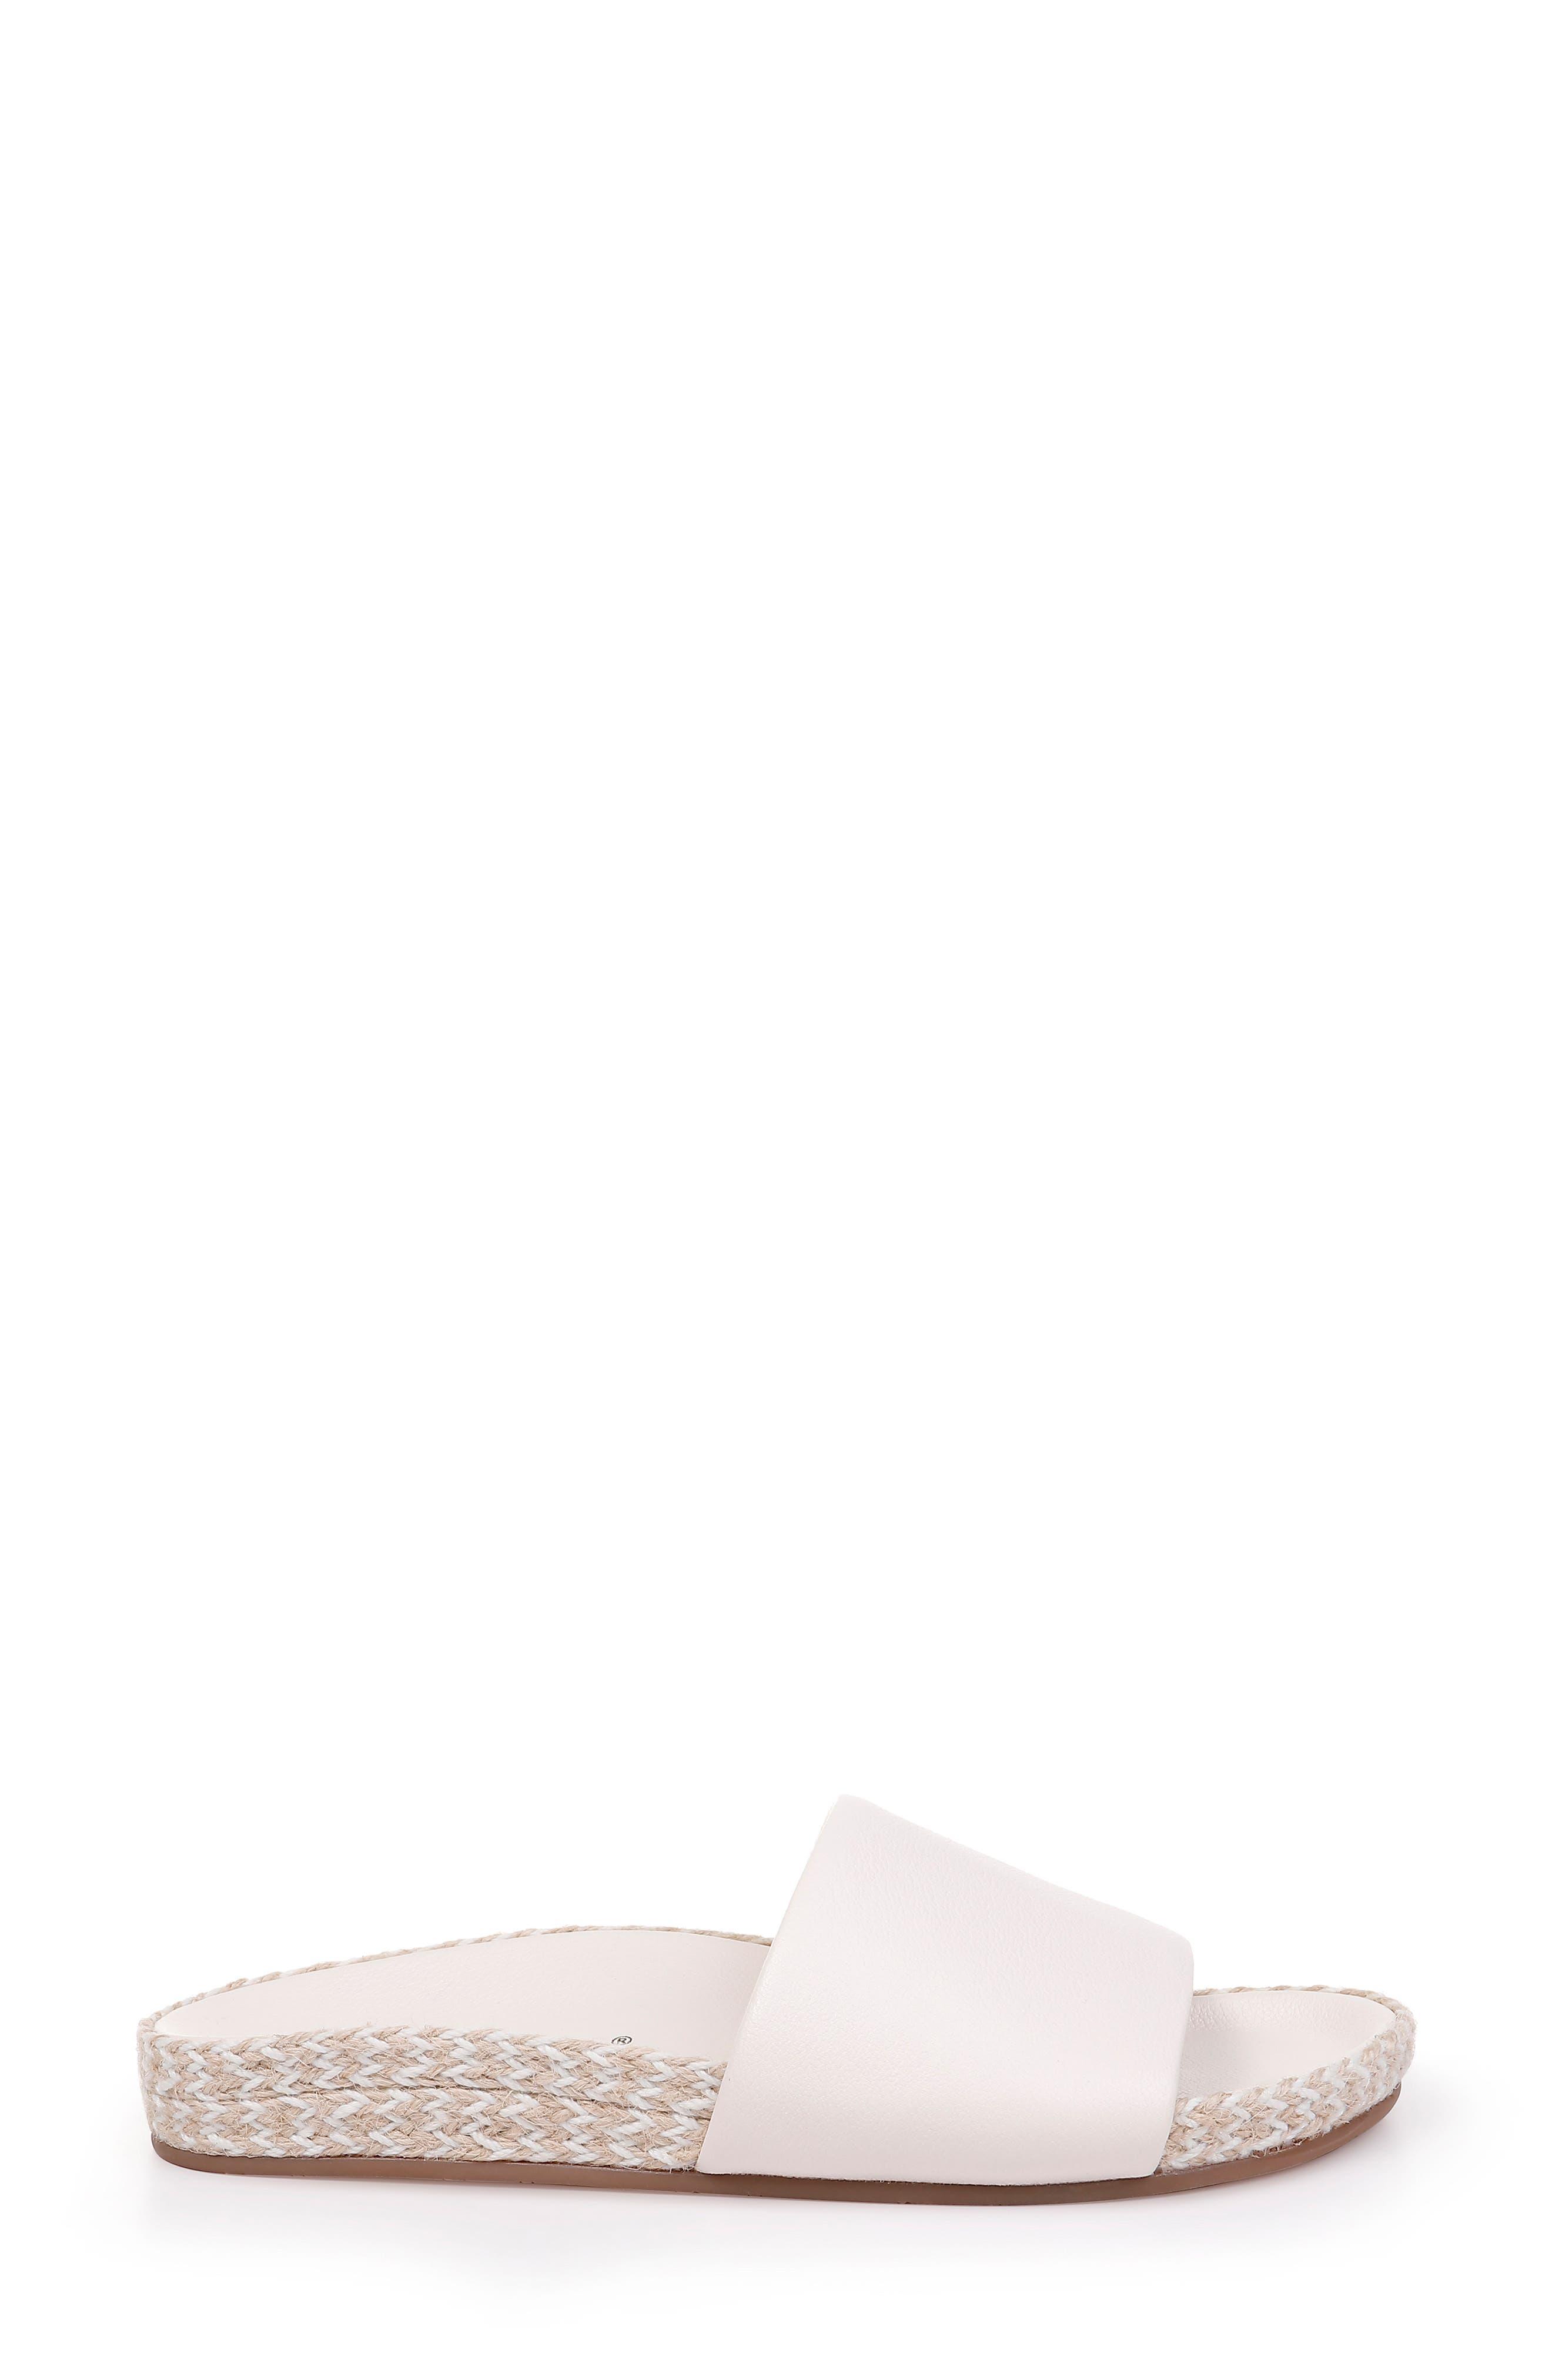 Sandford Espadrille Slide Sandal,                             Alternate thumbnail 3, color,                             OFF WHITE LEATHER